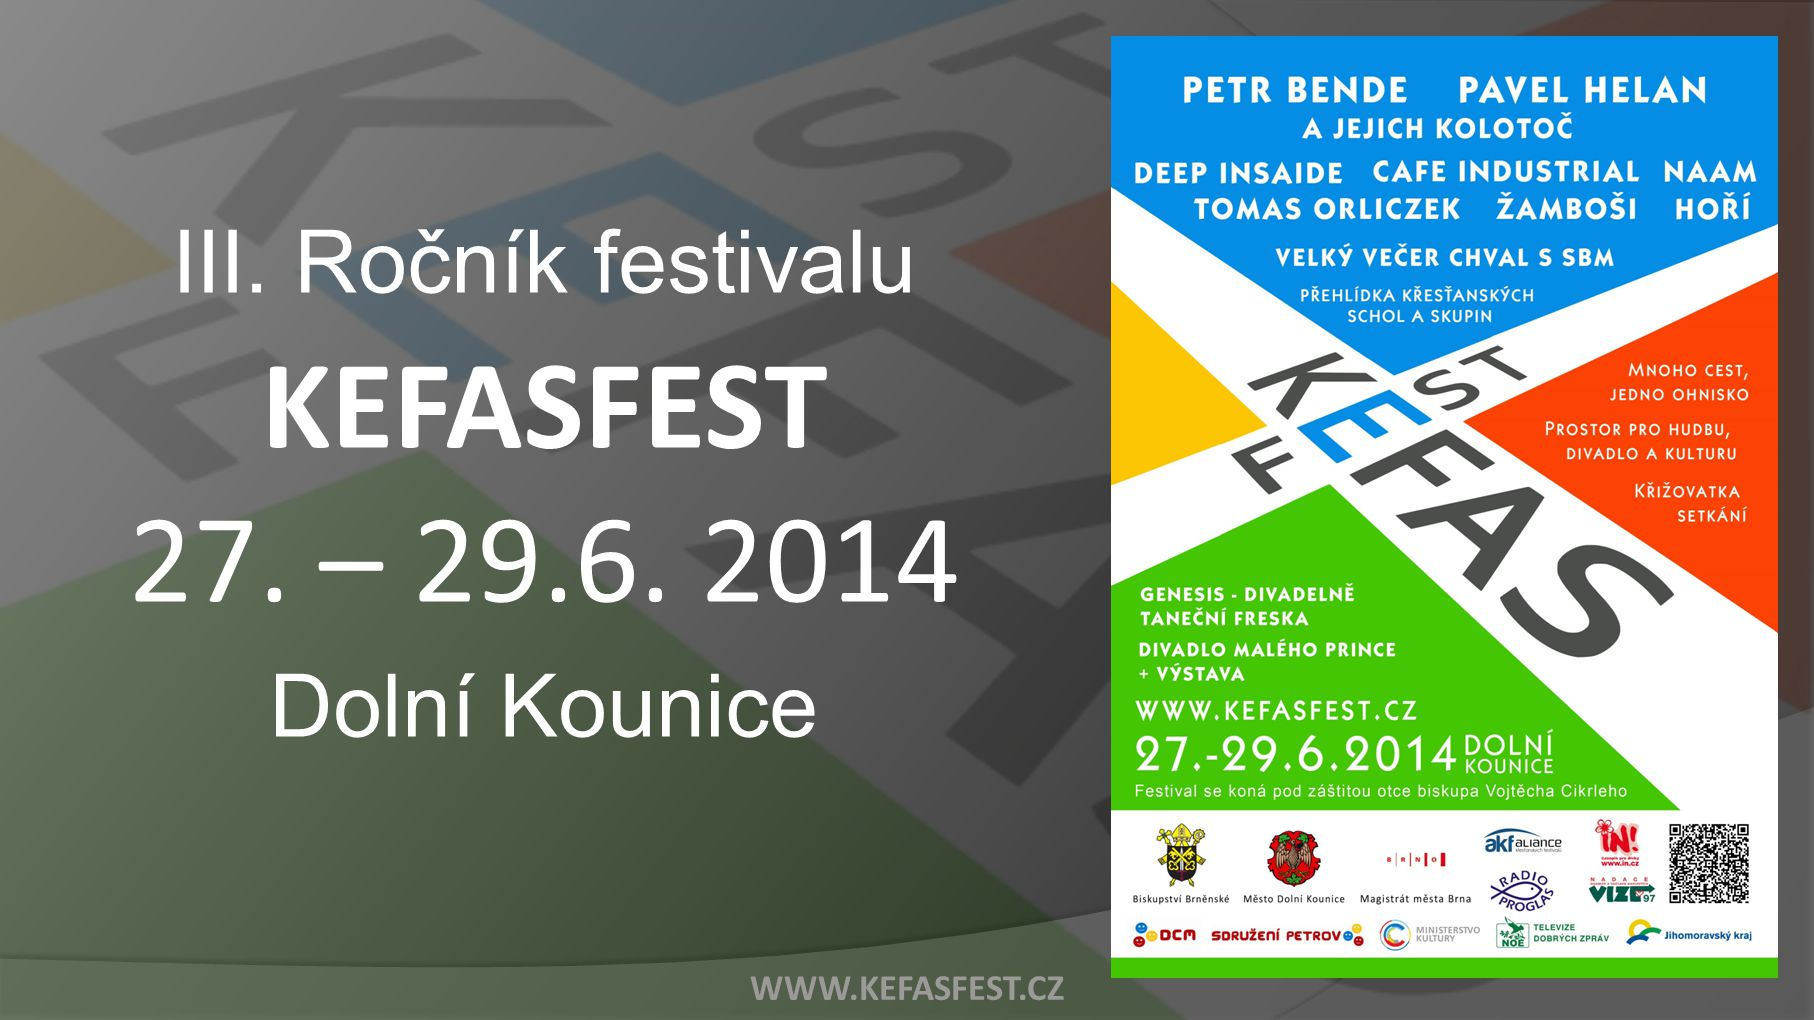 III. Ročník festivalu KEFASFEST 27. – 29.6. 2014 Dolní Kounice WWW.KEFASFEST.CZ